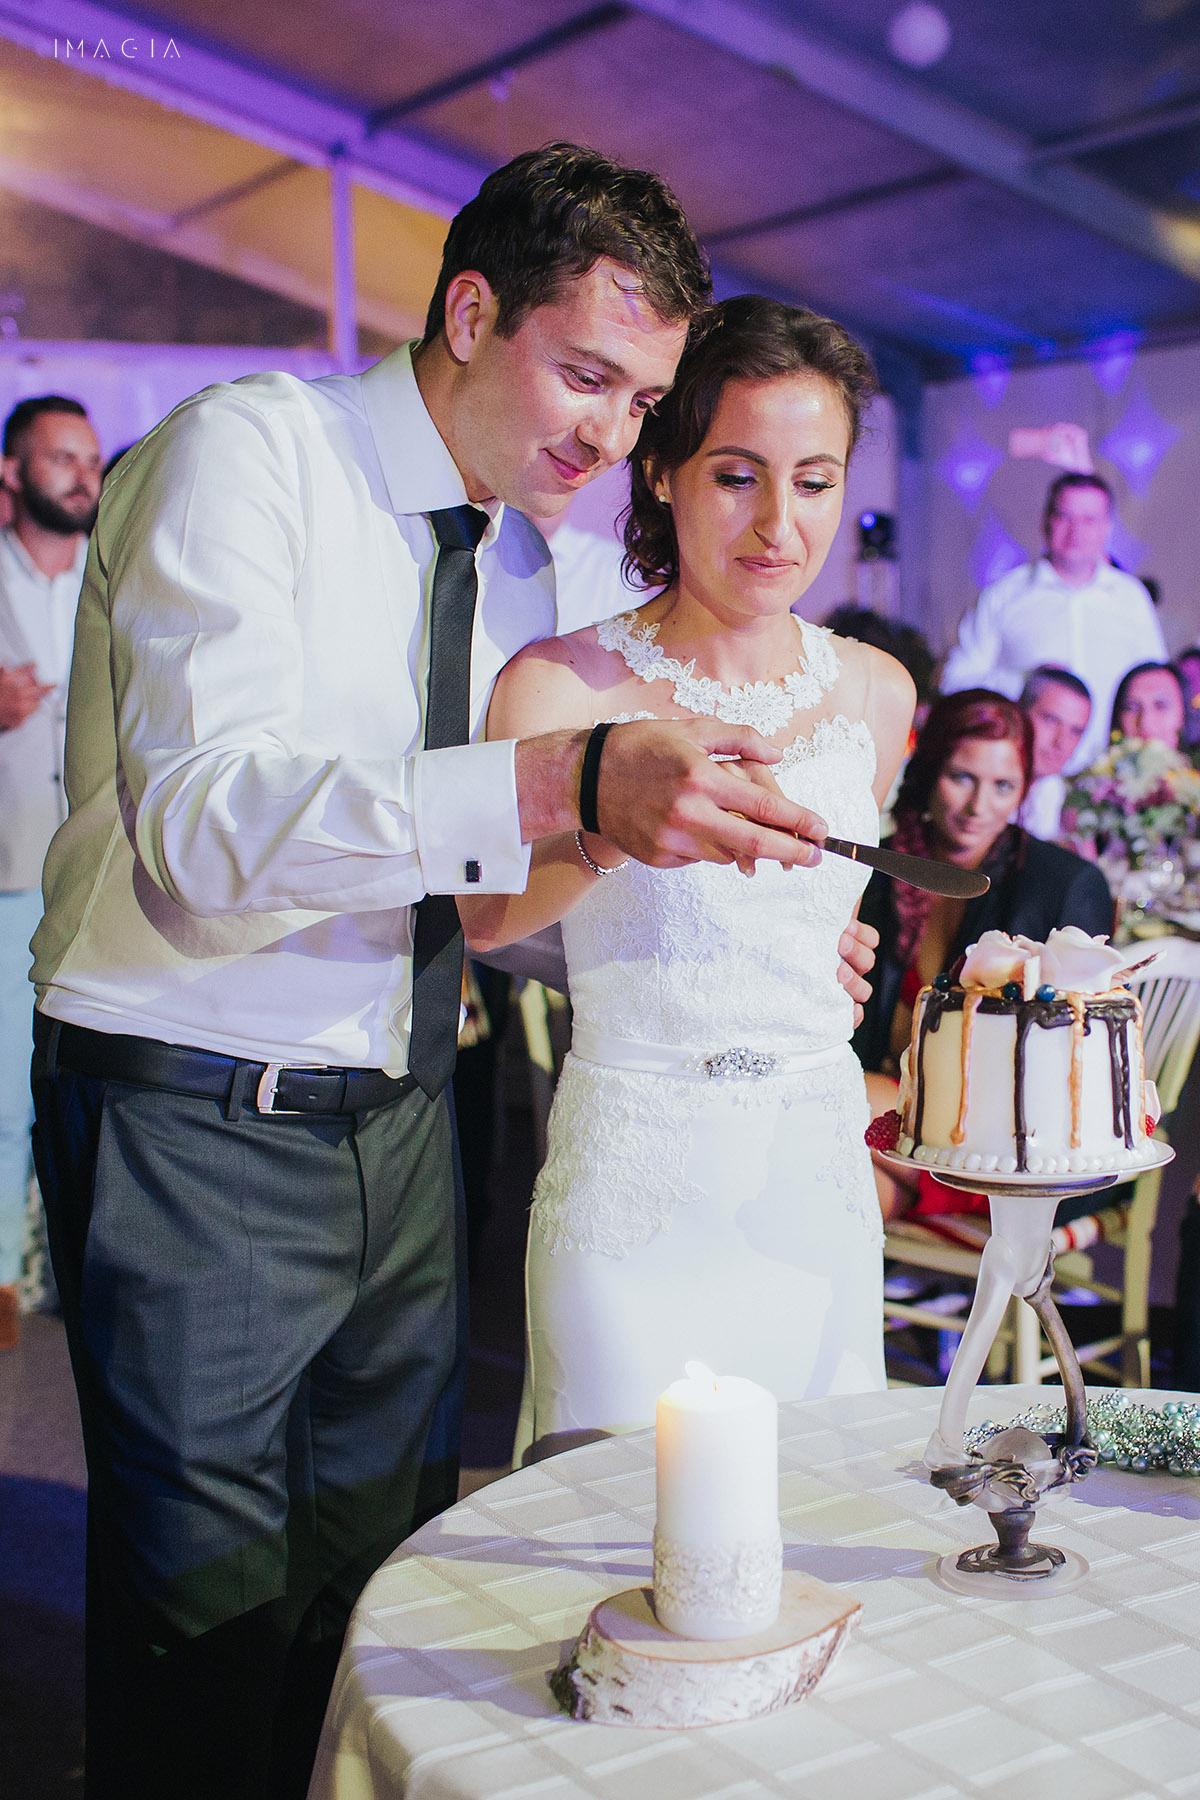 Miri taind tortulla o nunta in Baia Mare fotografiata de imagia.ro